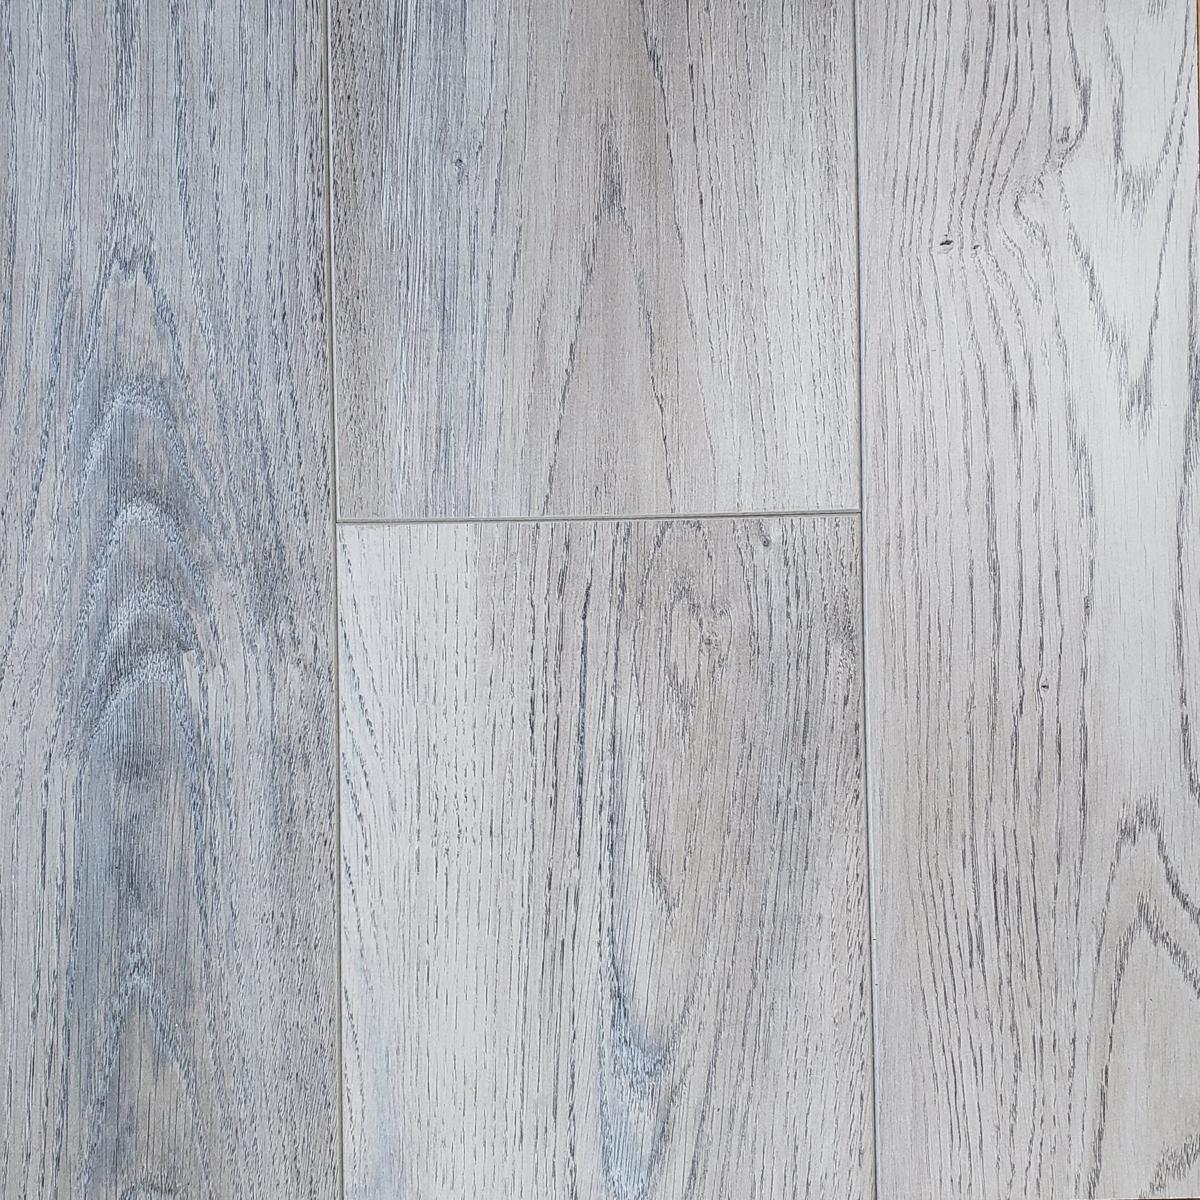 Laminate Tf6205 Embossed 12 3mm, Blue Gray Laminate Flooring